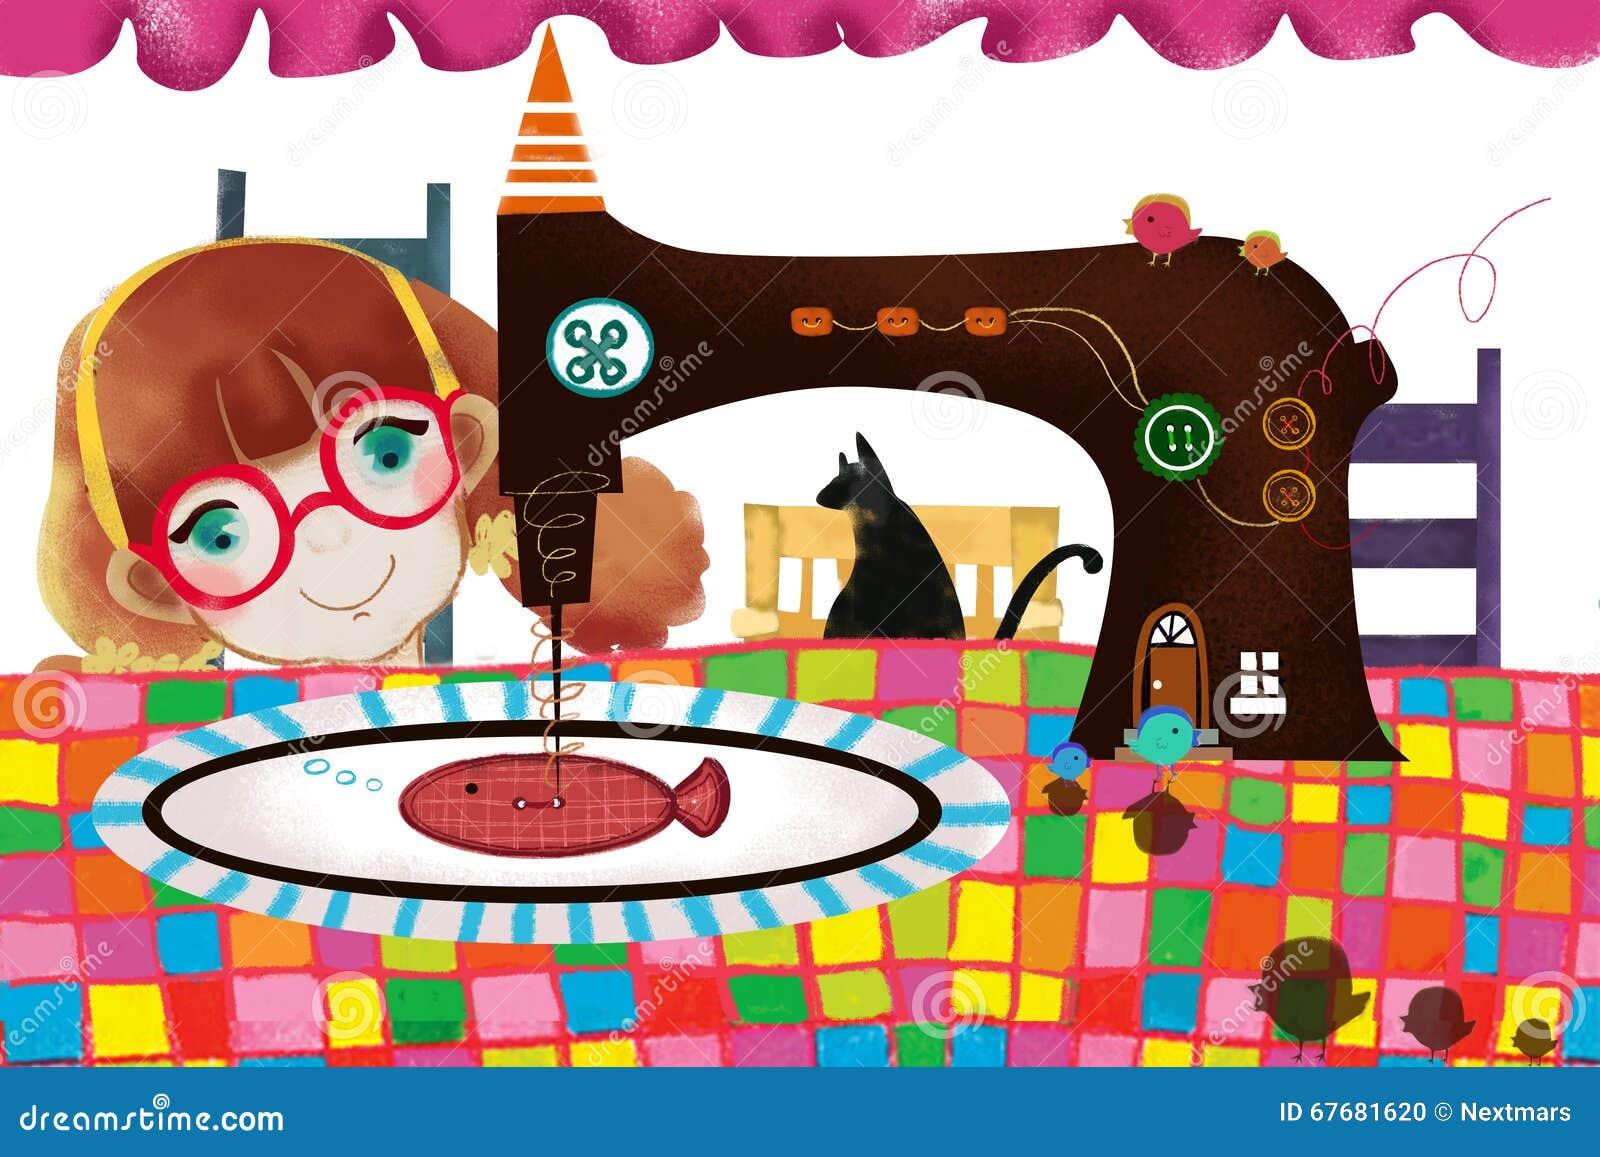 Illustration Für Kinder: Nähmaschine-Mädchen Stock Abbildung ...